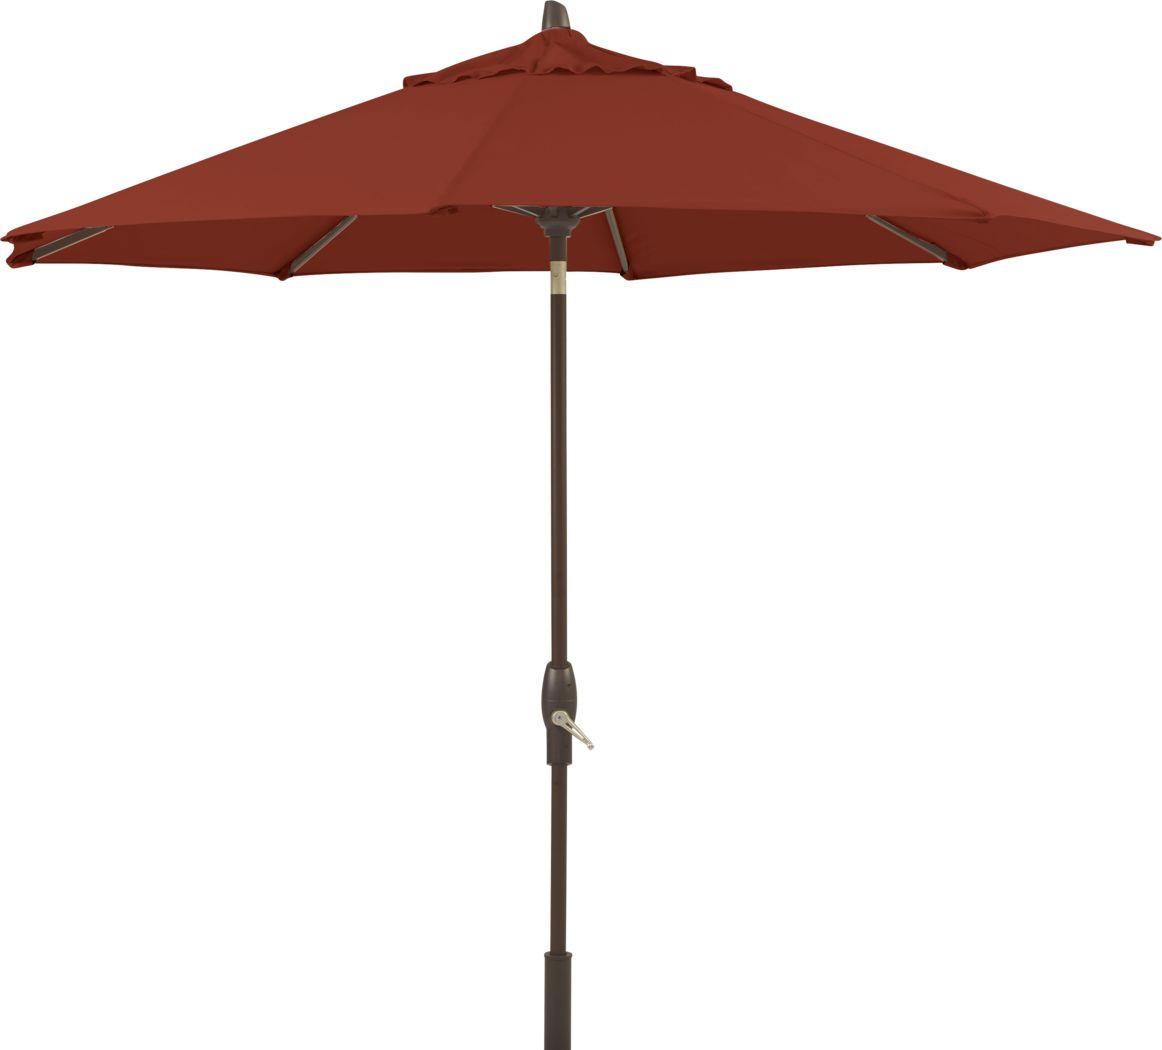 Seaport 9' Octagon Terracotta Outdoor Umbrella